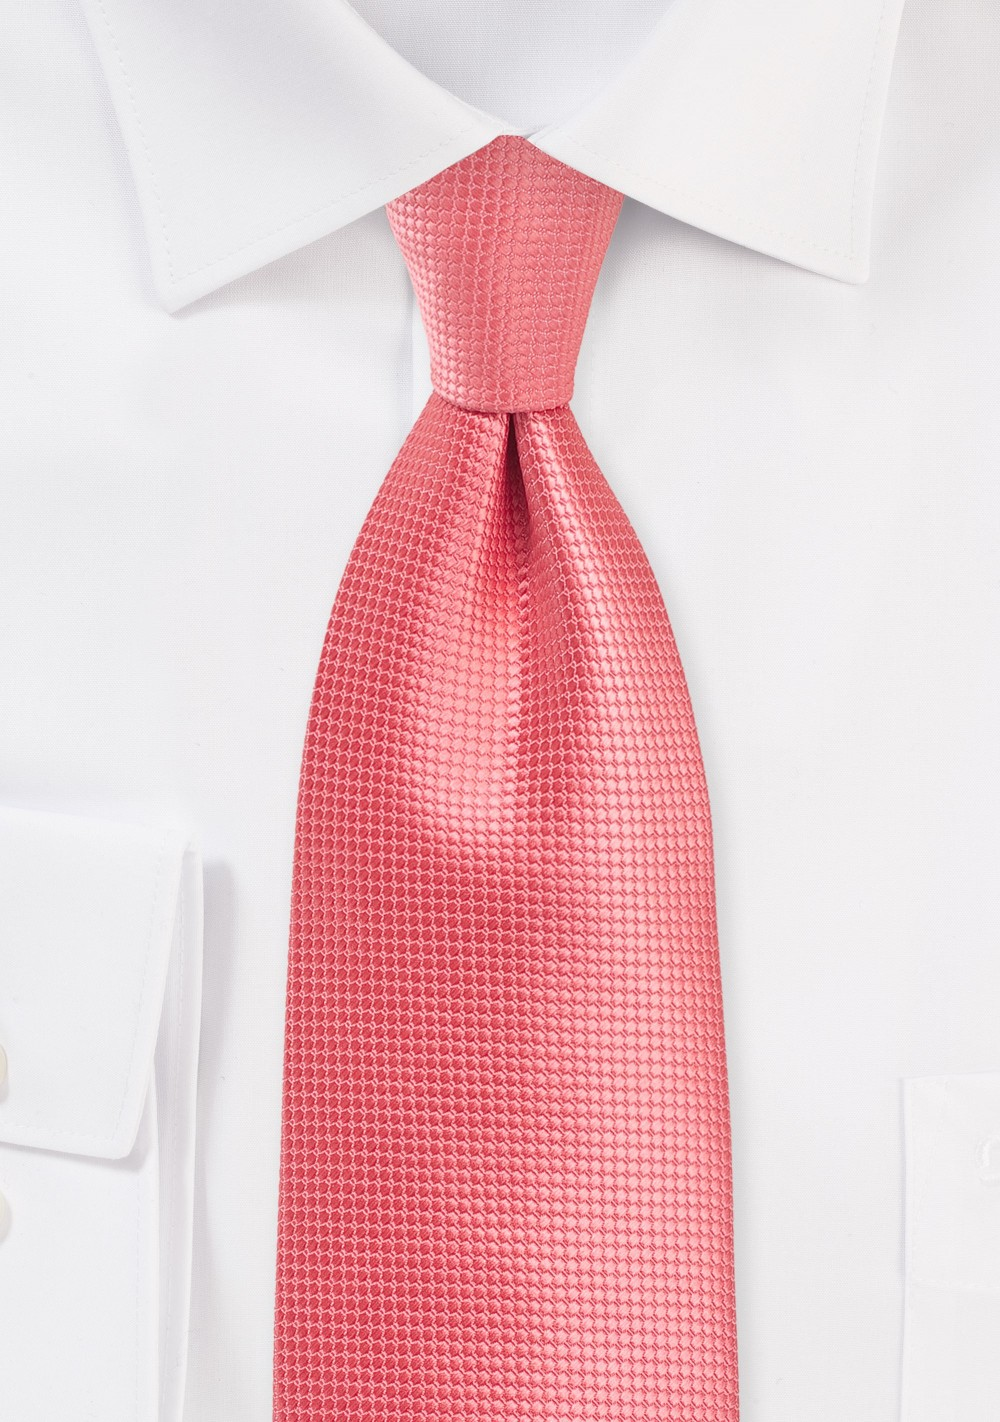 Textured Tie in Georgia Peach